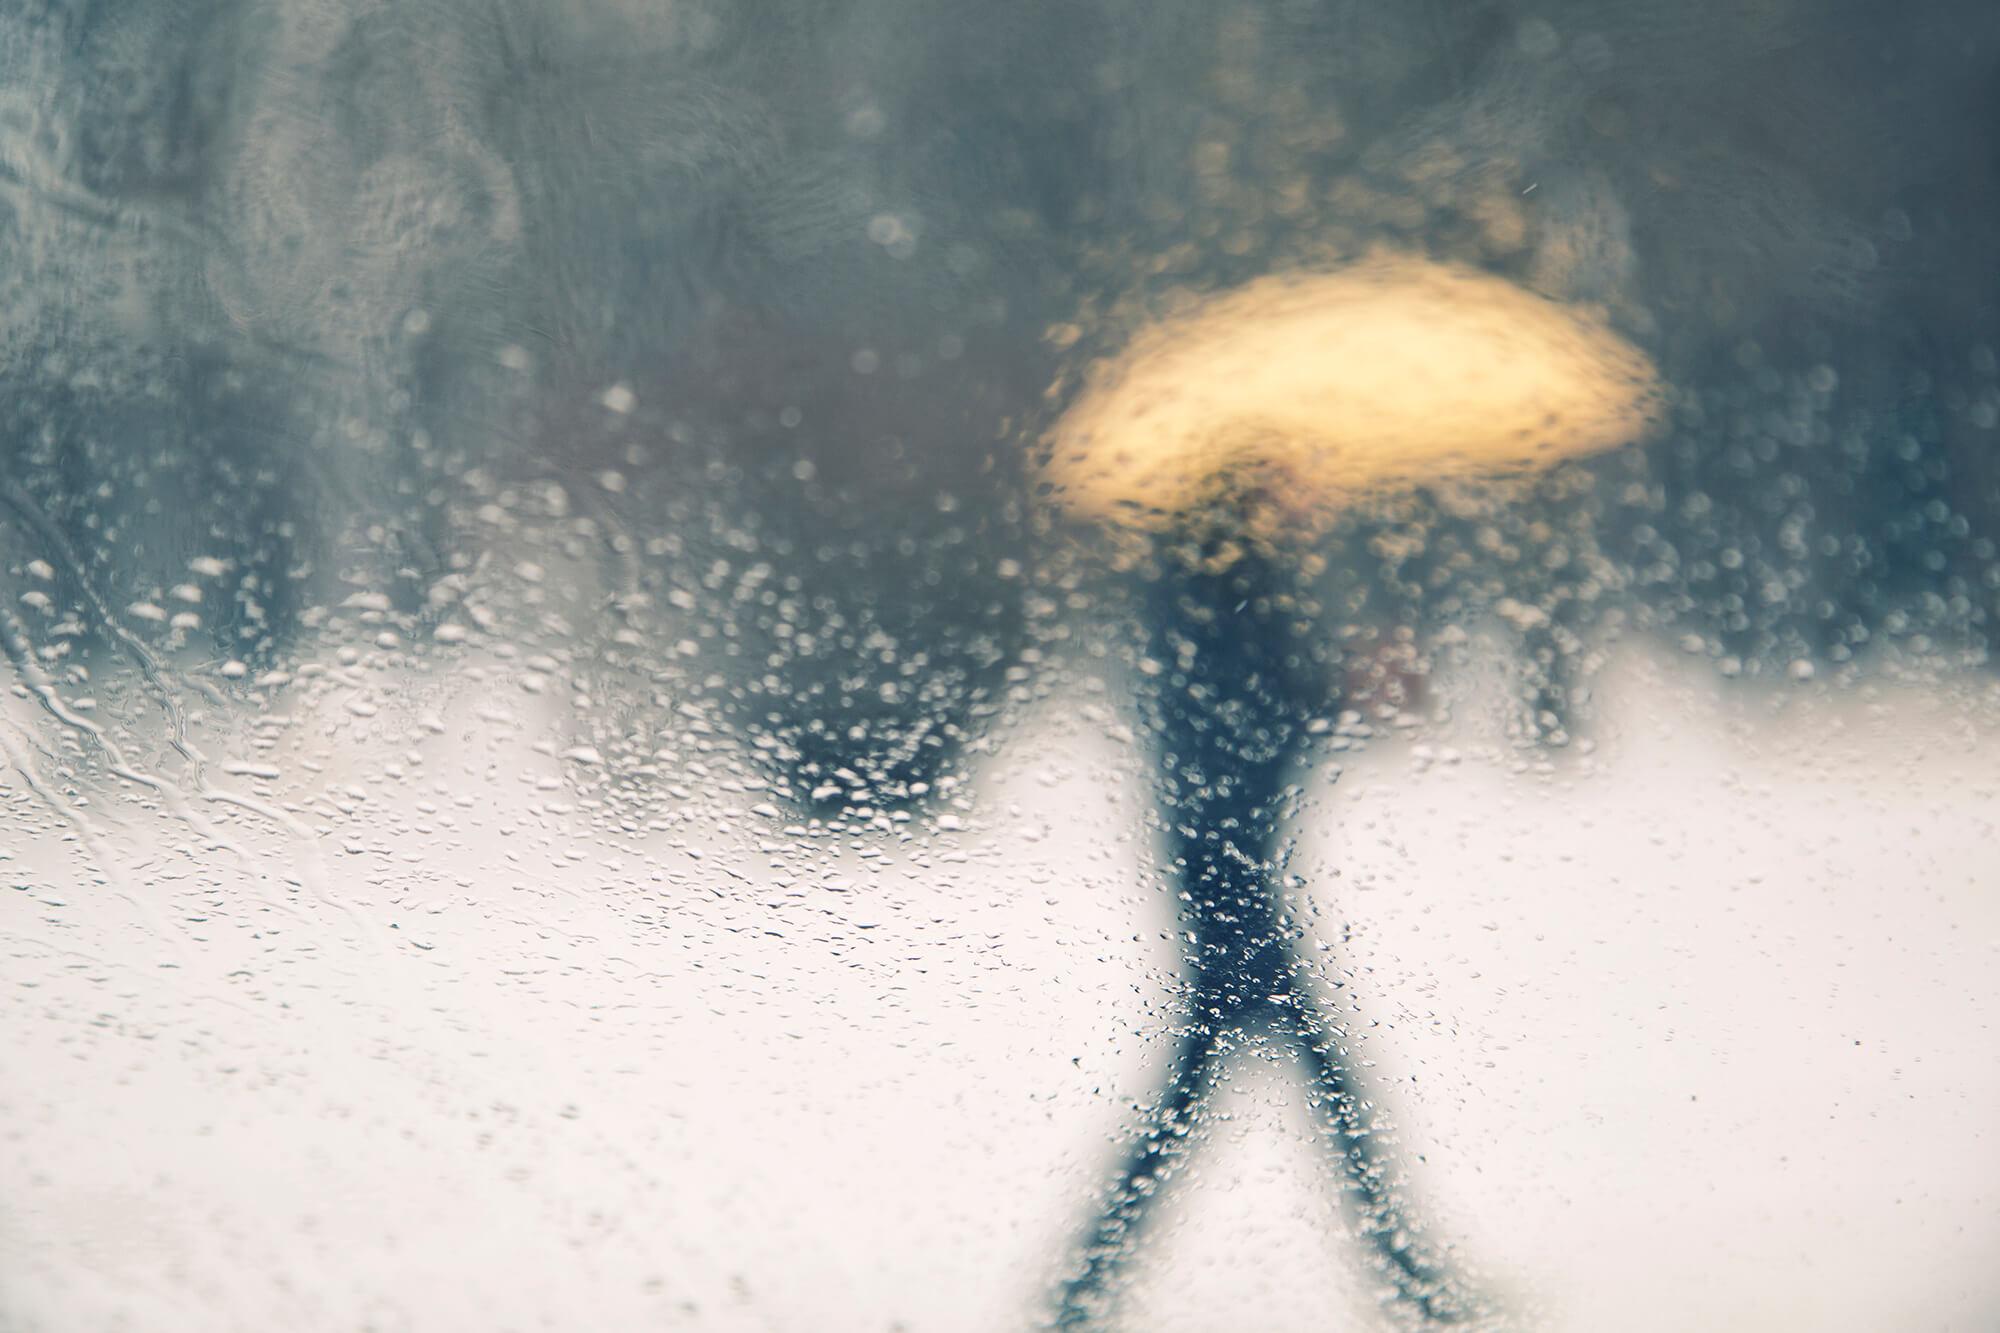 pedestrian walking in the rain with umbrella